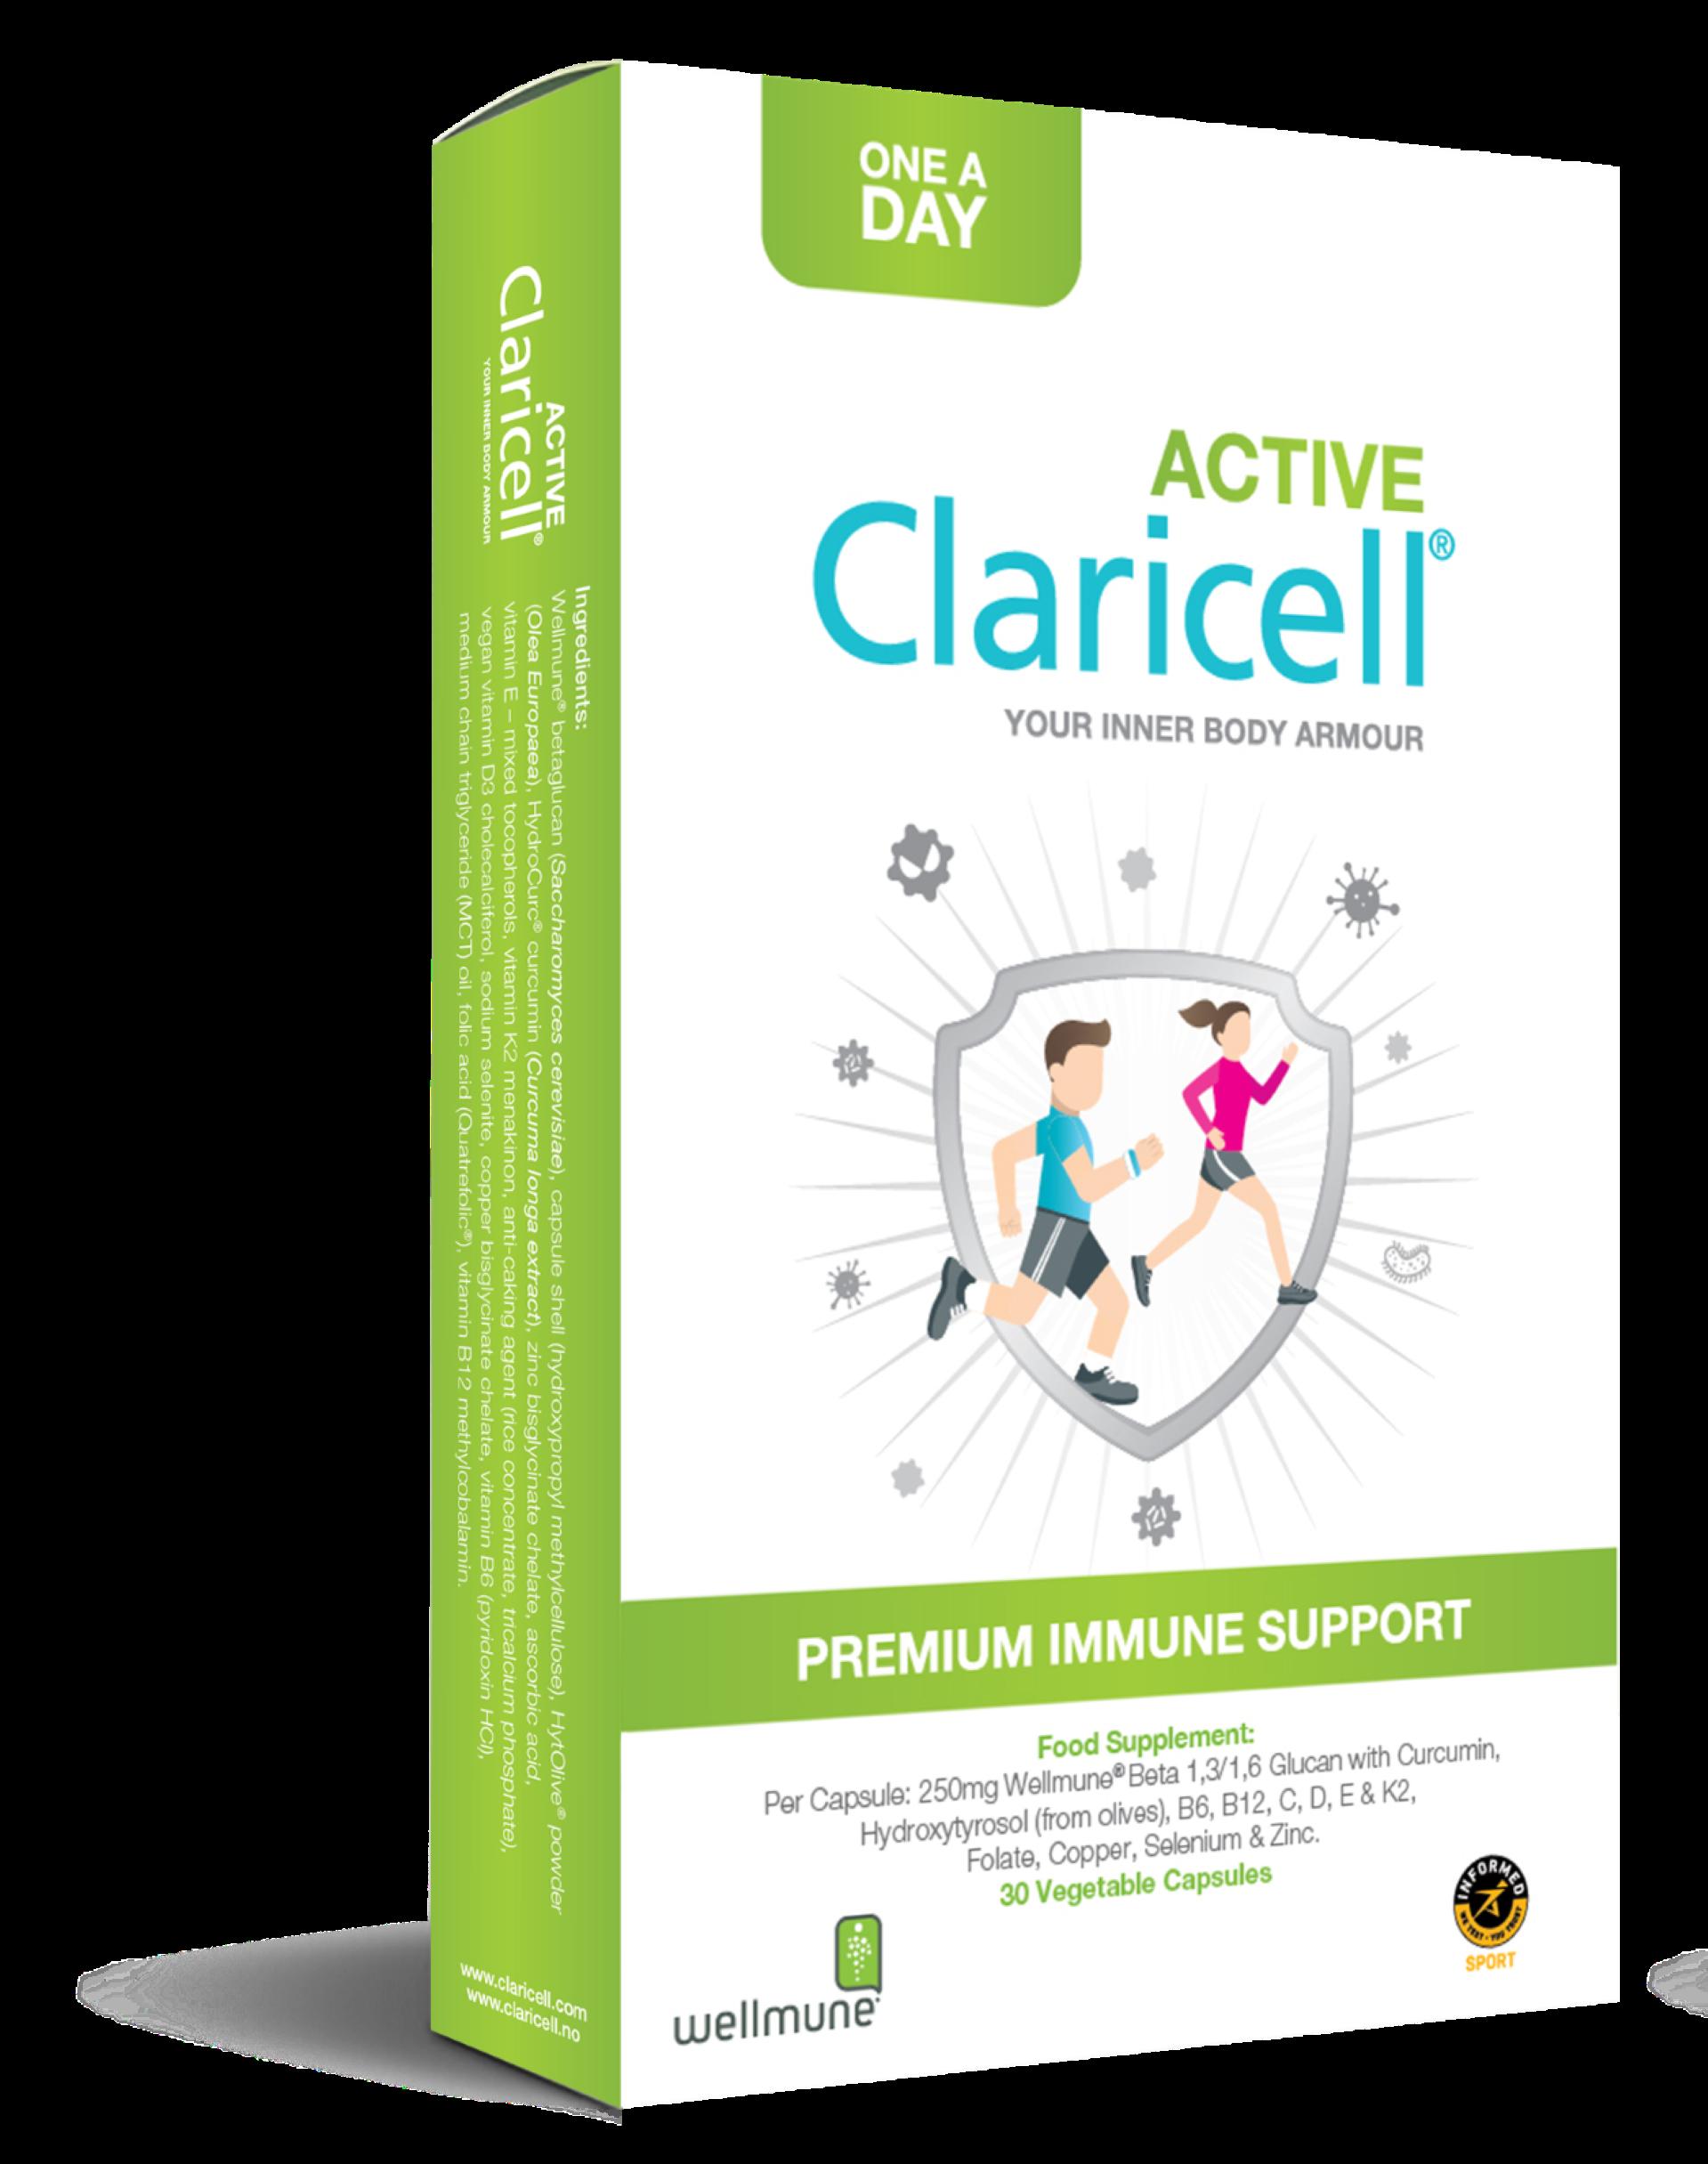 Claricell Active kosttilskudd for aktive og de som trener